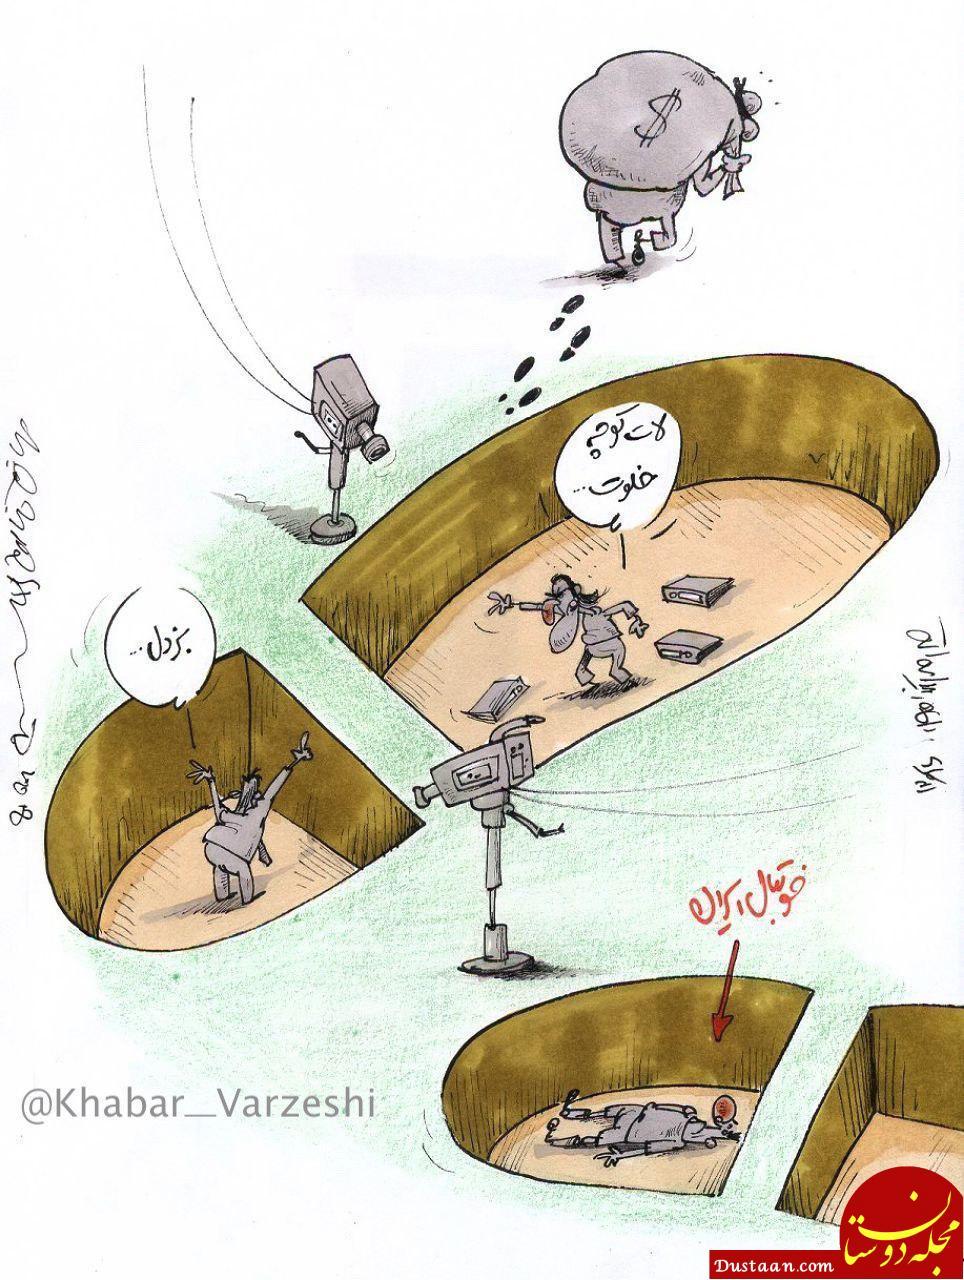 www.dustaan.com علی کریمی: کی روش لات کوچه خلوت است! +عکس